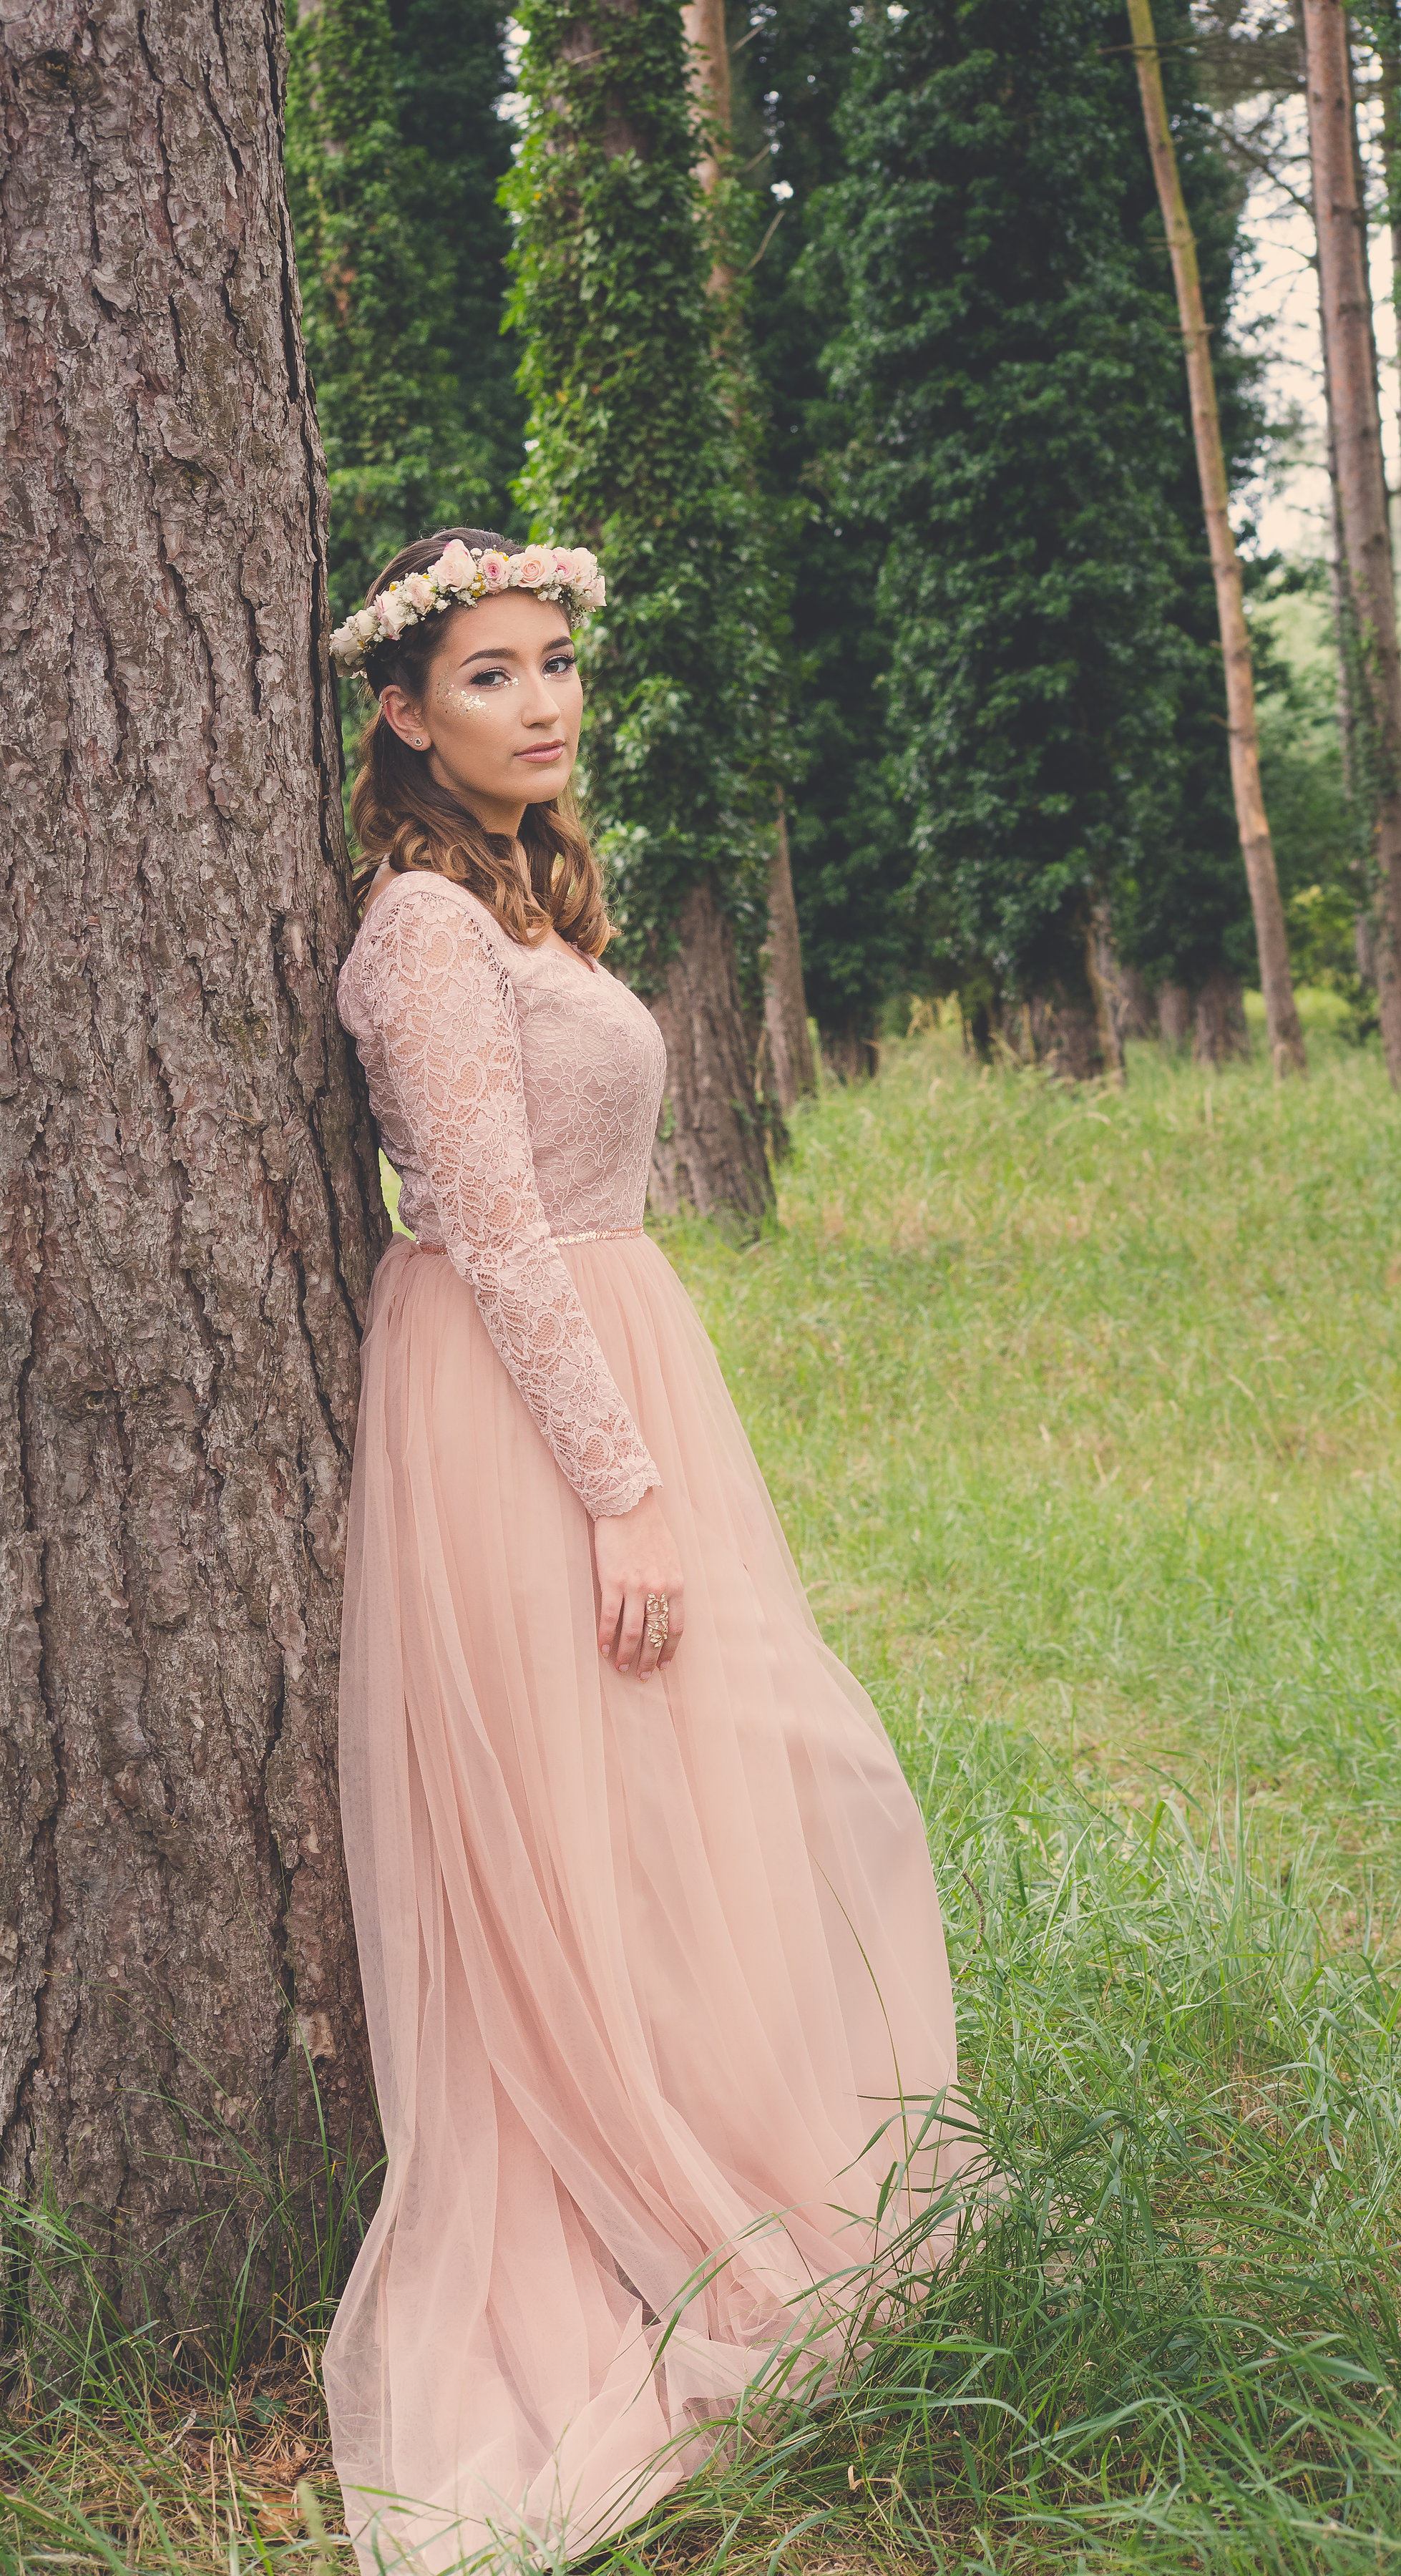 Blush Pink Wedding Dress by River Elliot Bridal